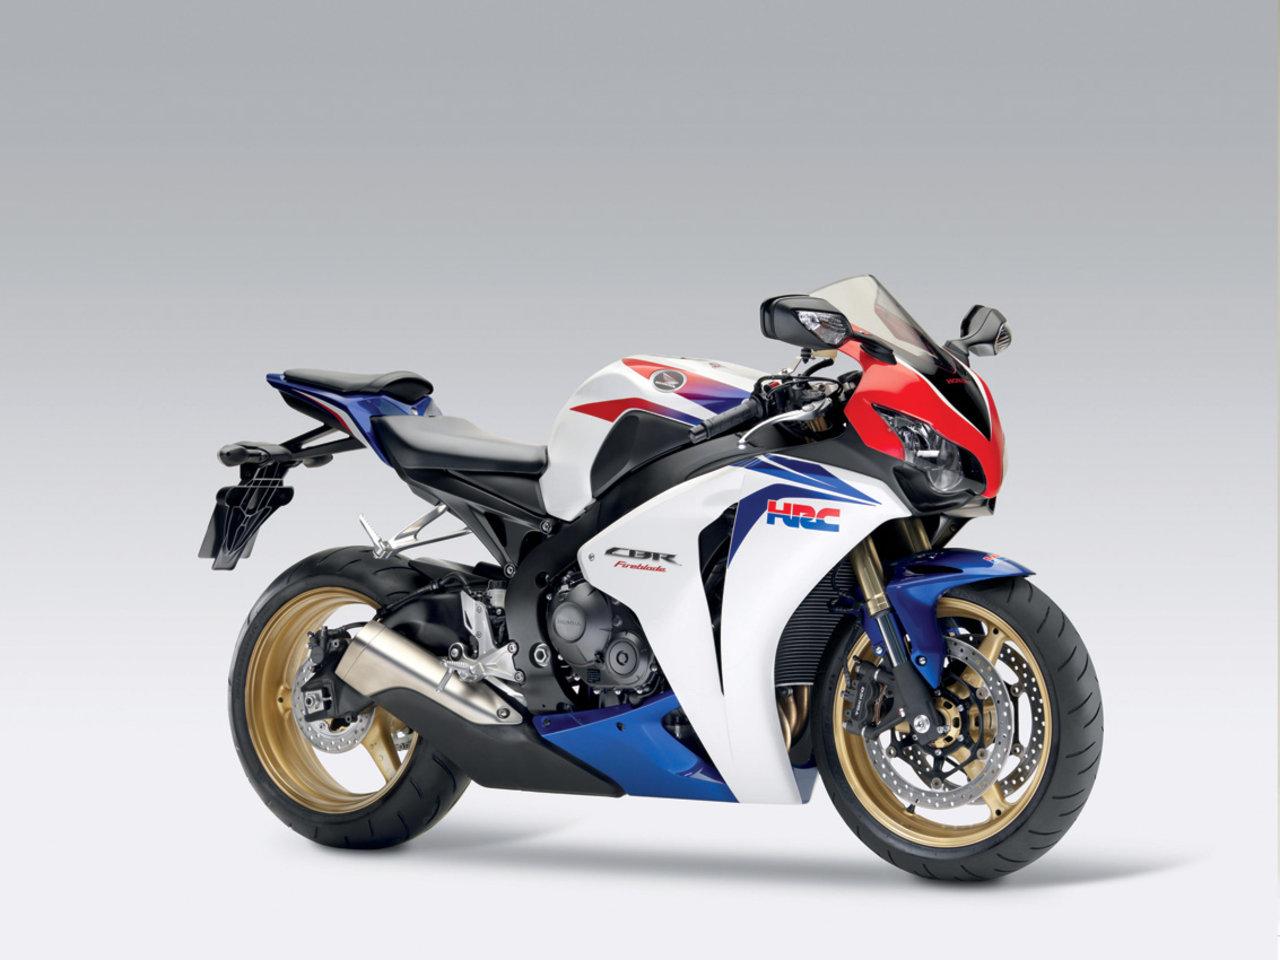 Motorcycle Honda Cbr1000rr Hrc Motor Modif Contest